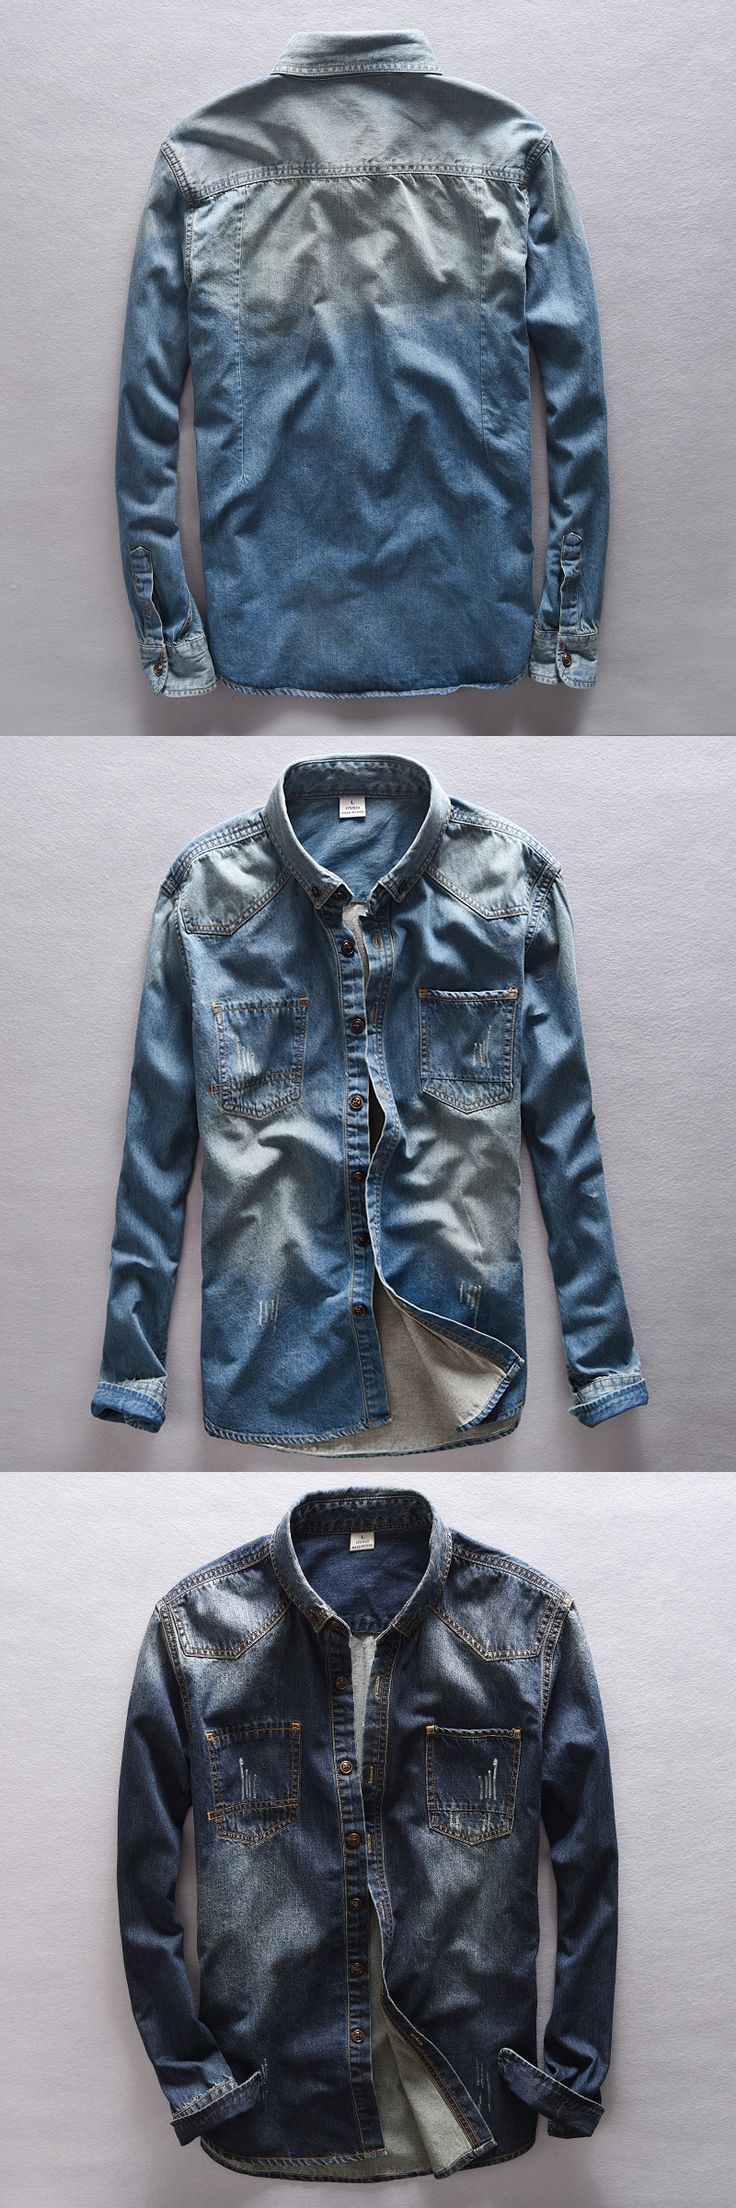 Italy Brand Suehaiwe's Fashion Casual Denim Shirt Men Pure Cotton Long Sleeve Slim Mens Shirt Fall Jeans Shirts camisa masculina